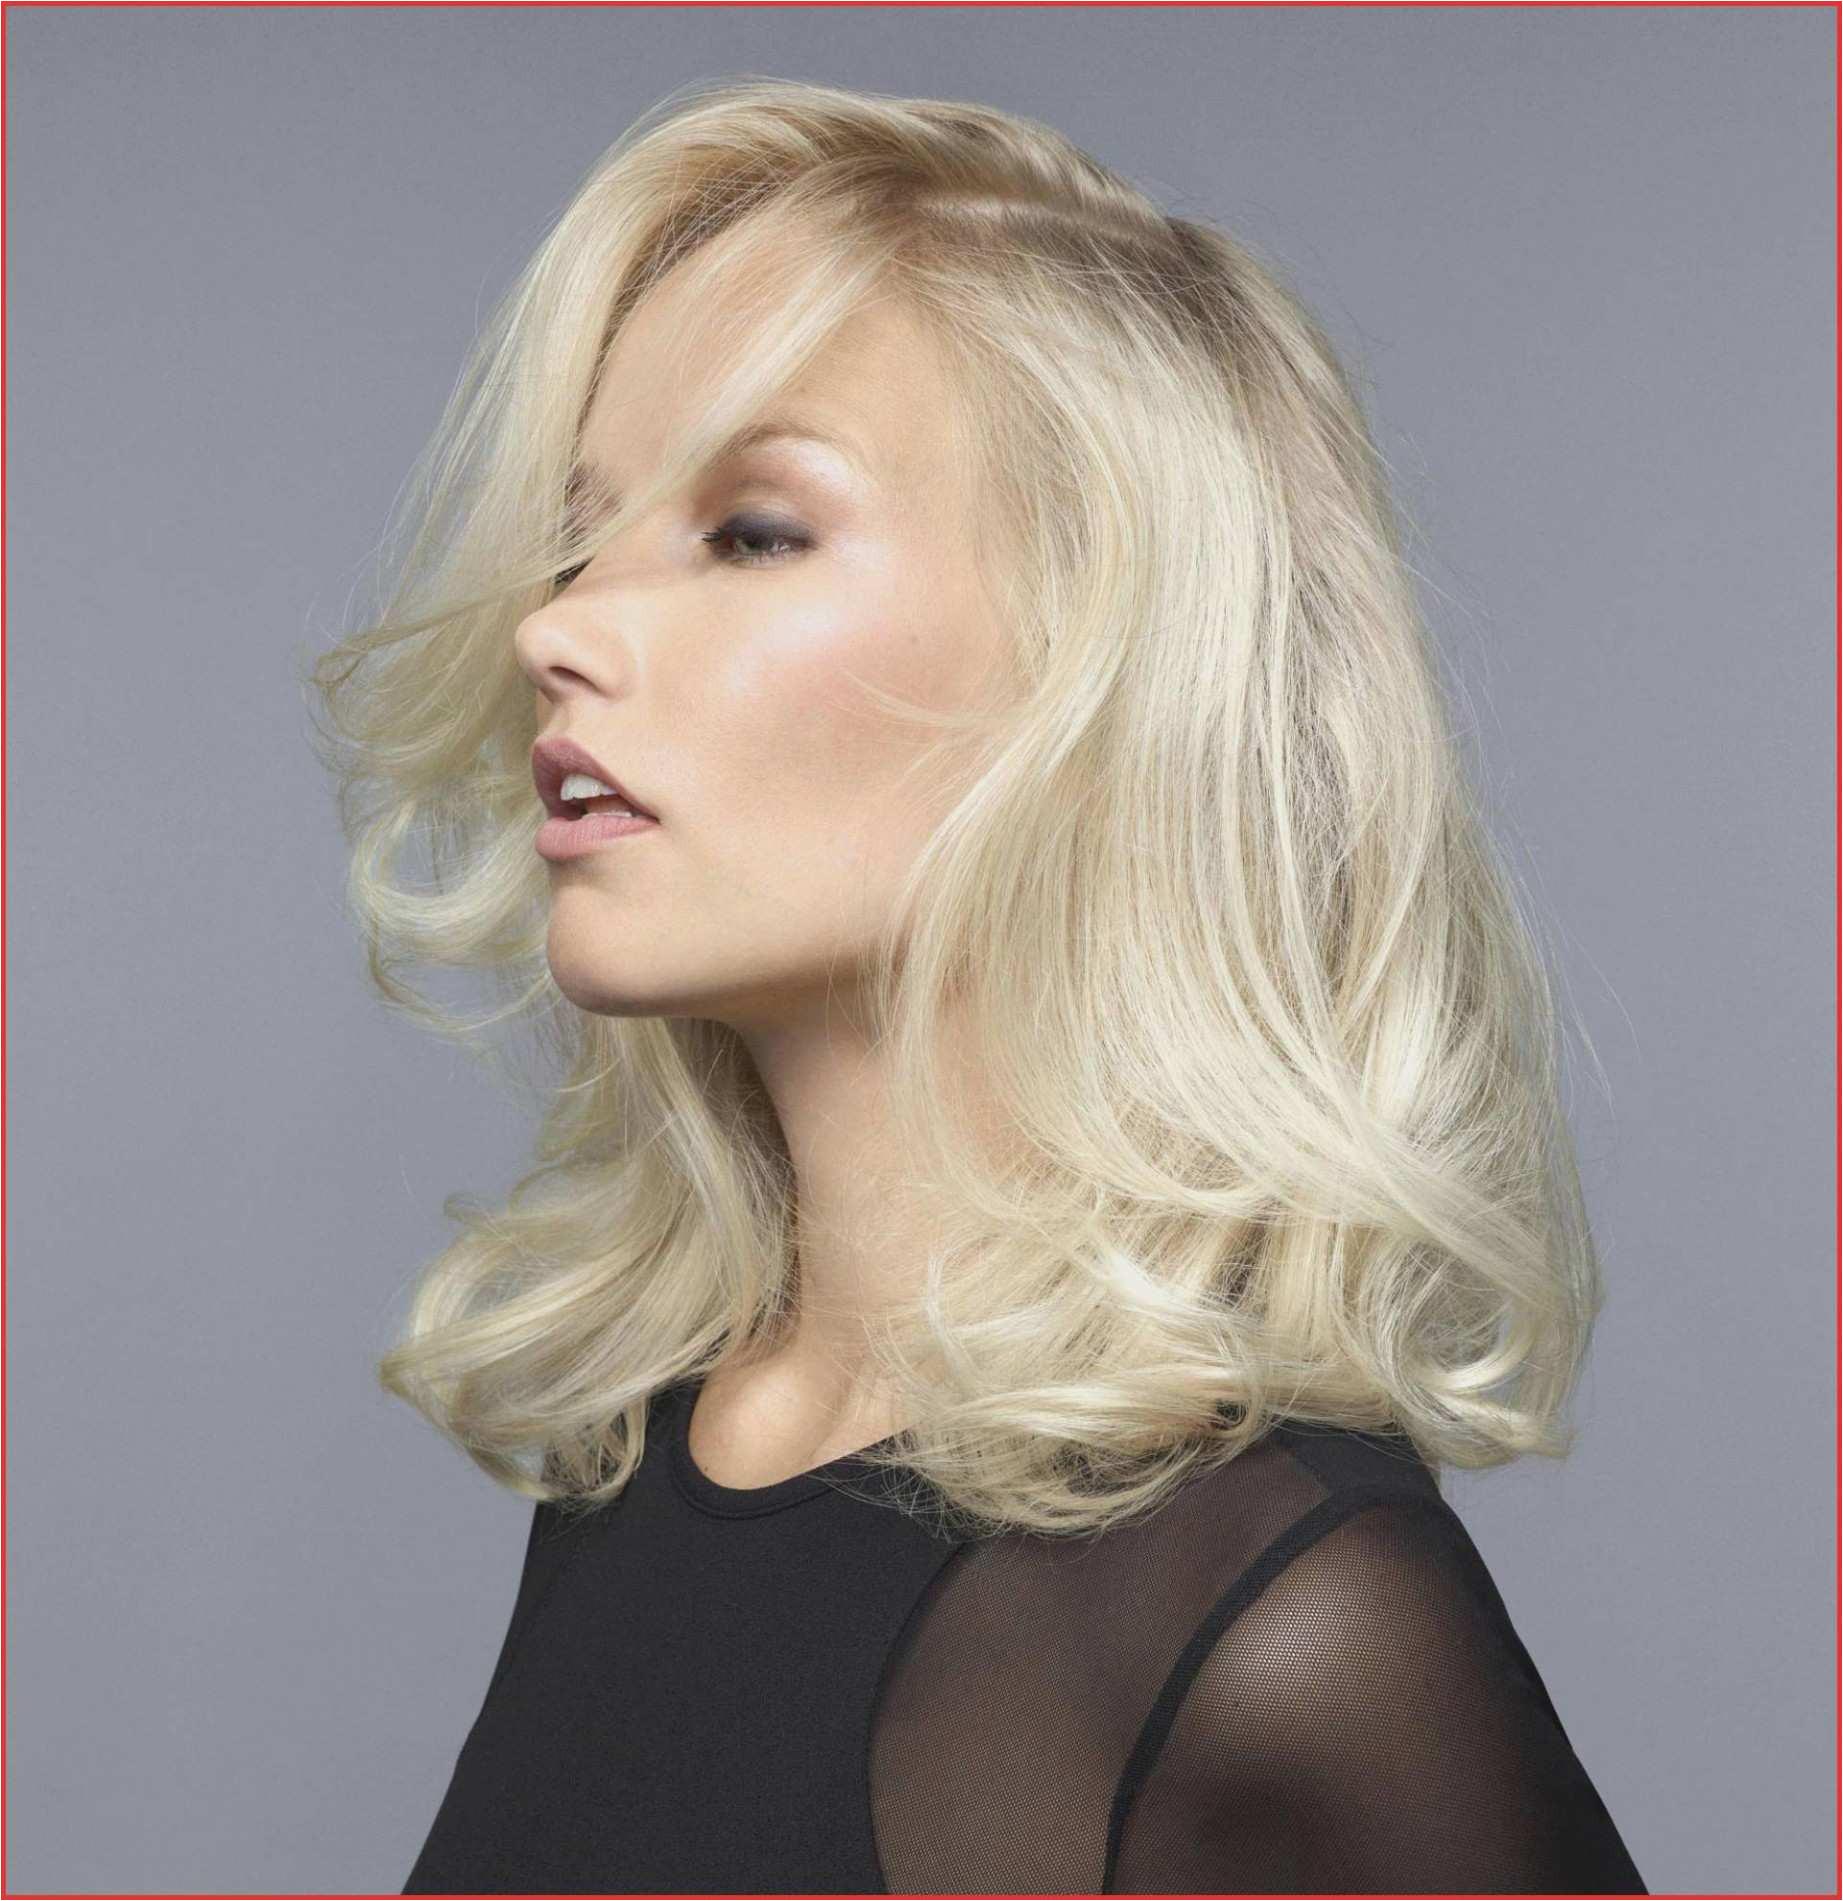 Korean Hairstyles Girl Inspirational 20 New Hairstyle For Medium Hair For Girl – New Hairstyle Ideas